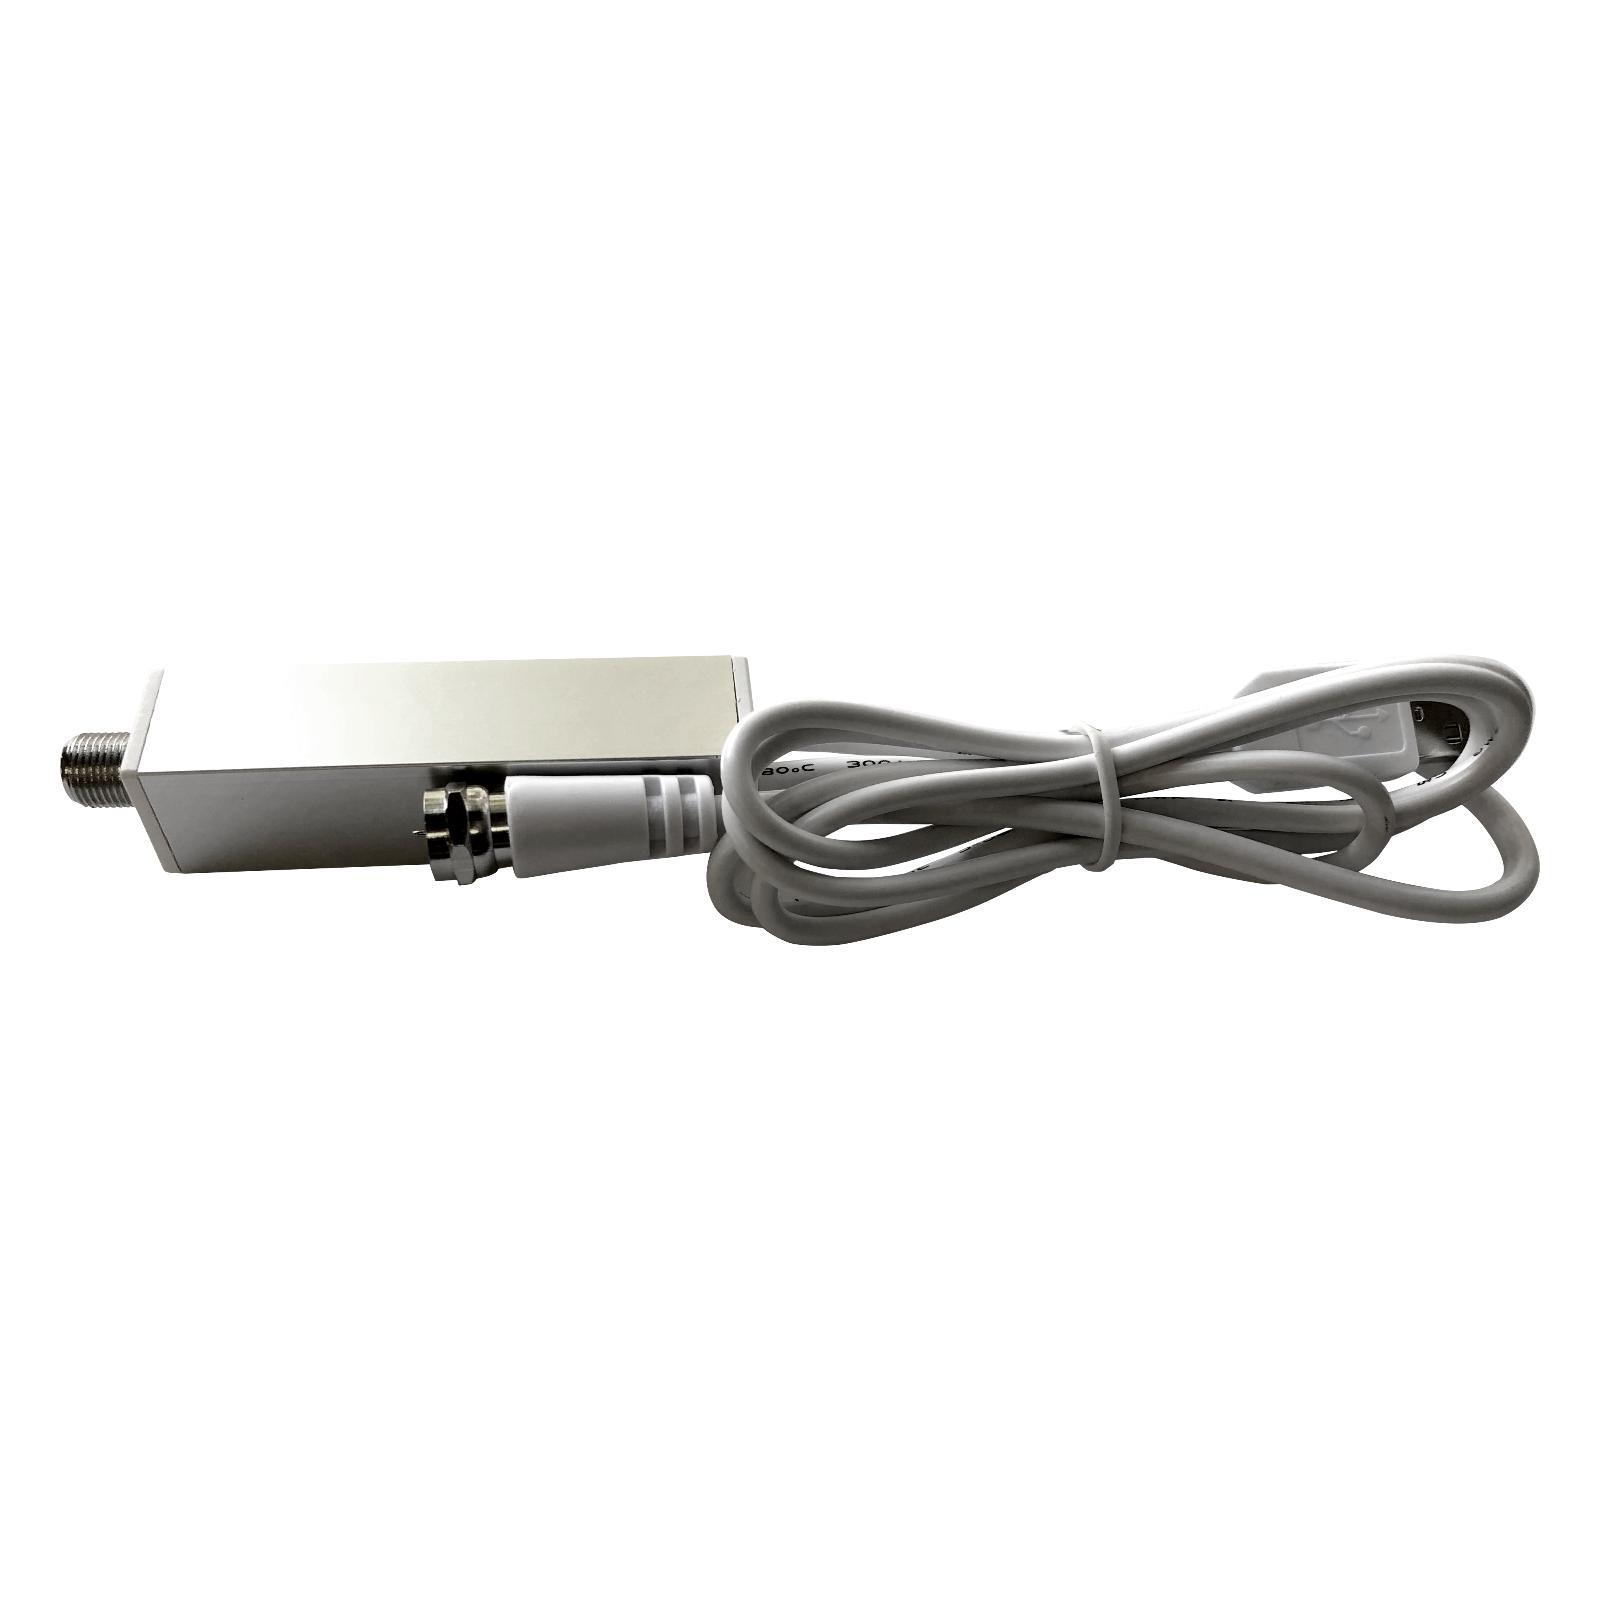 Mohu 60 Mile Antenna - Modern Soundbar